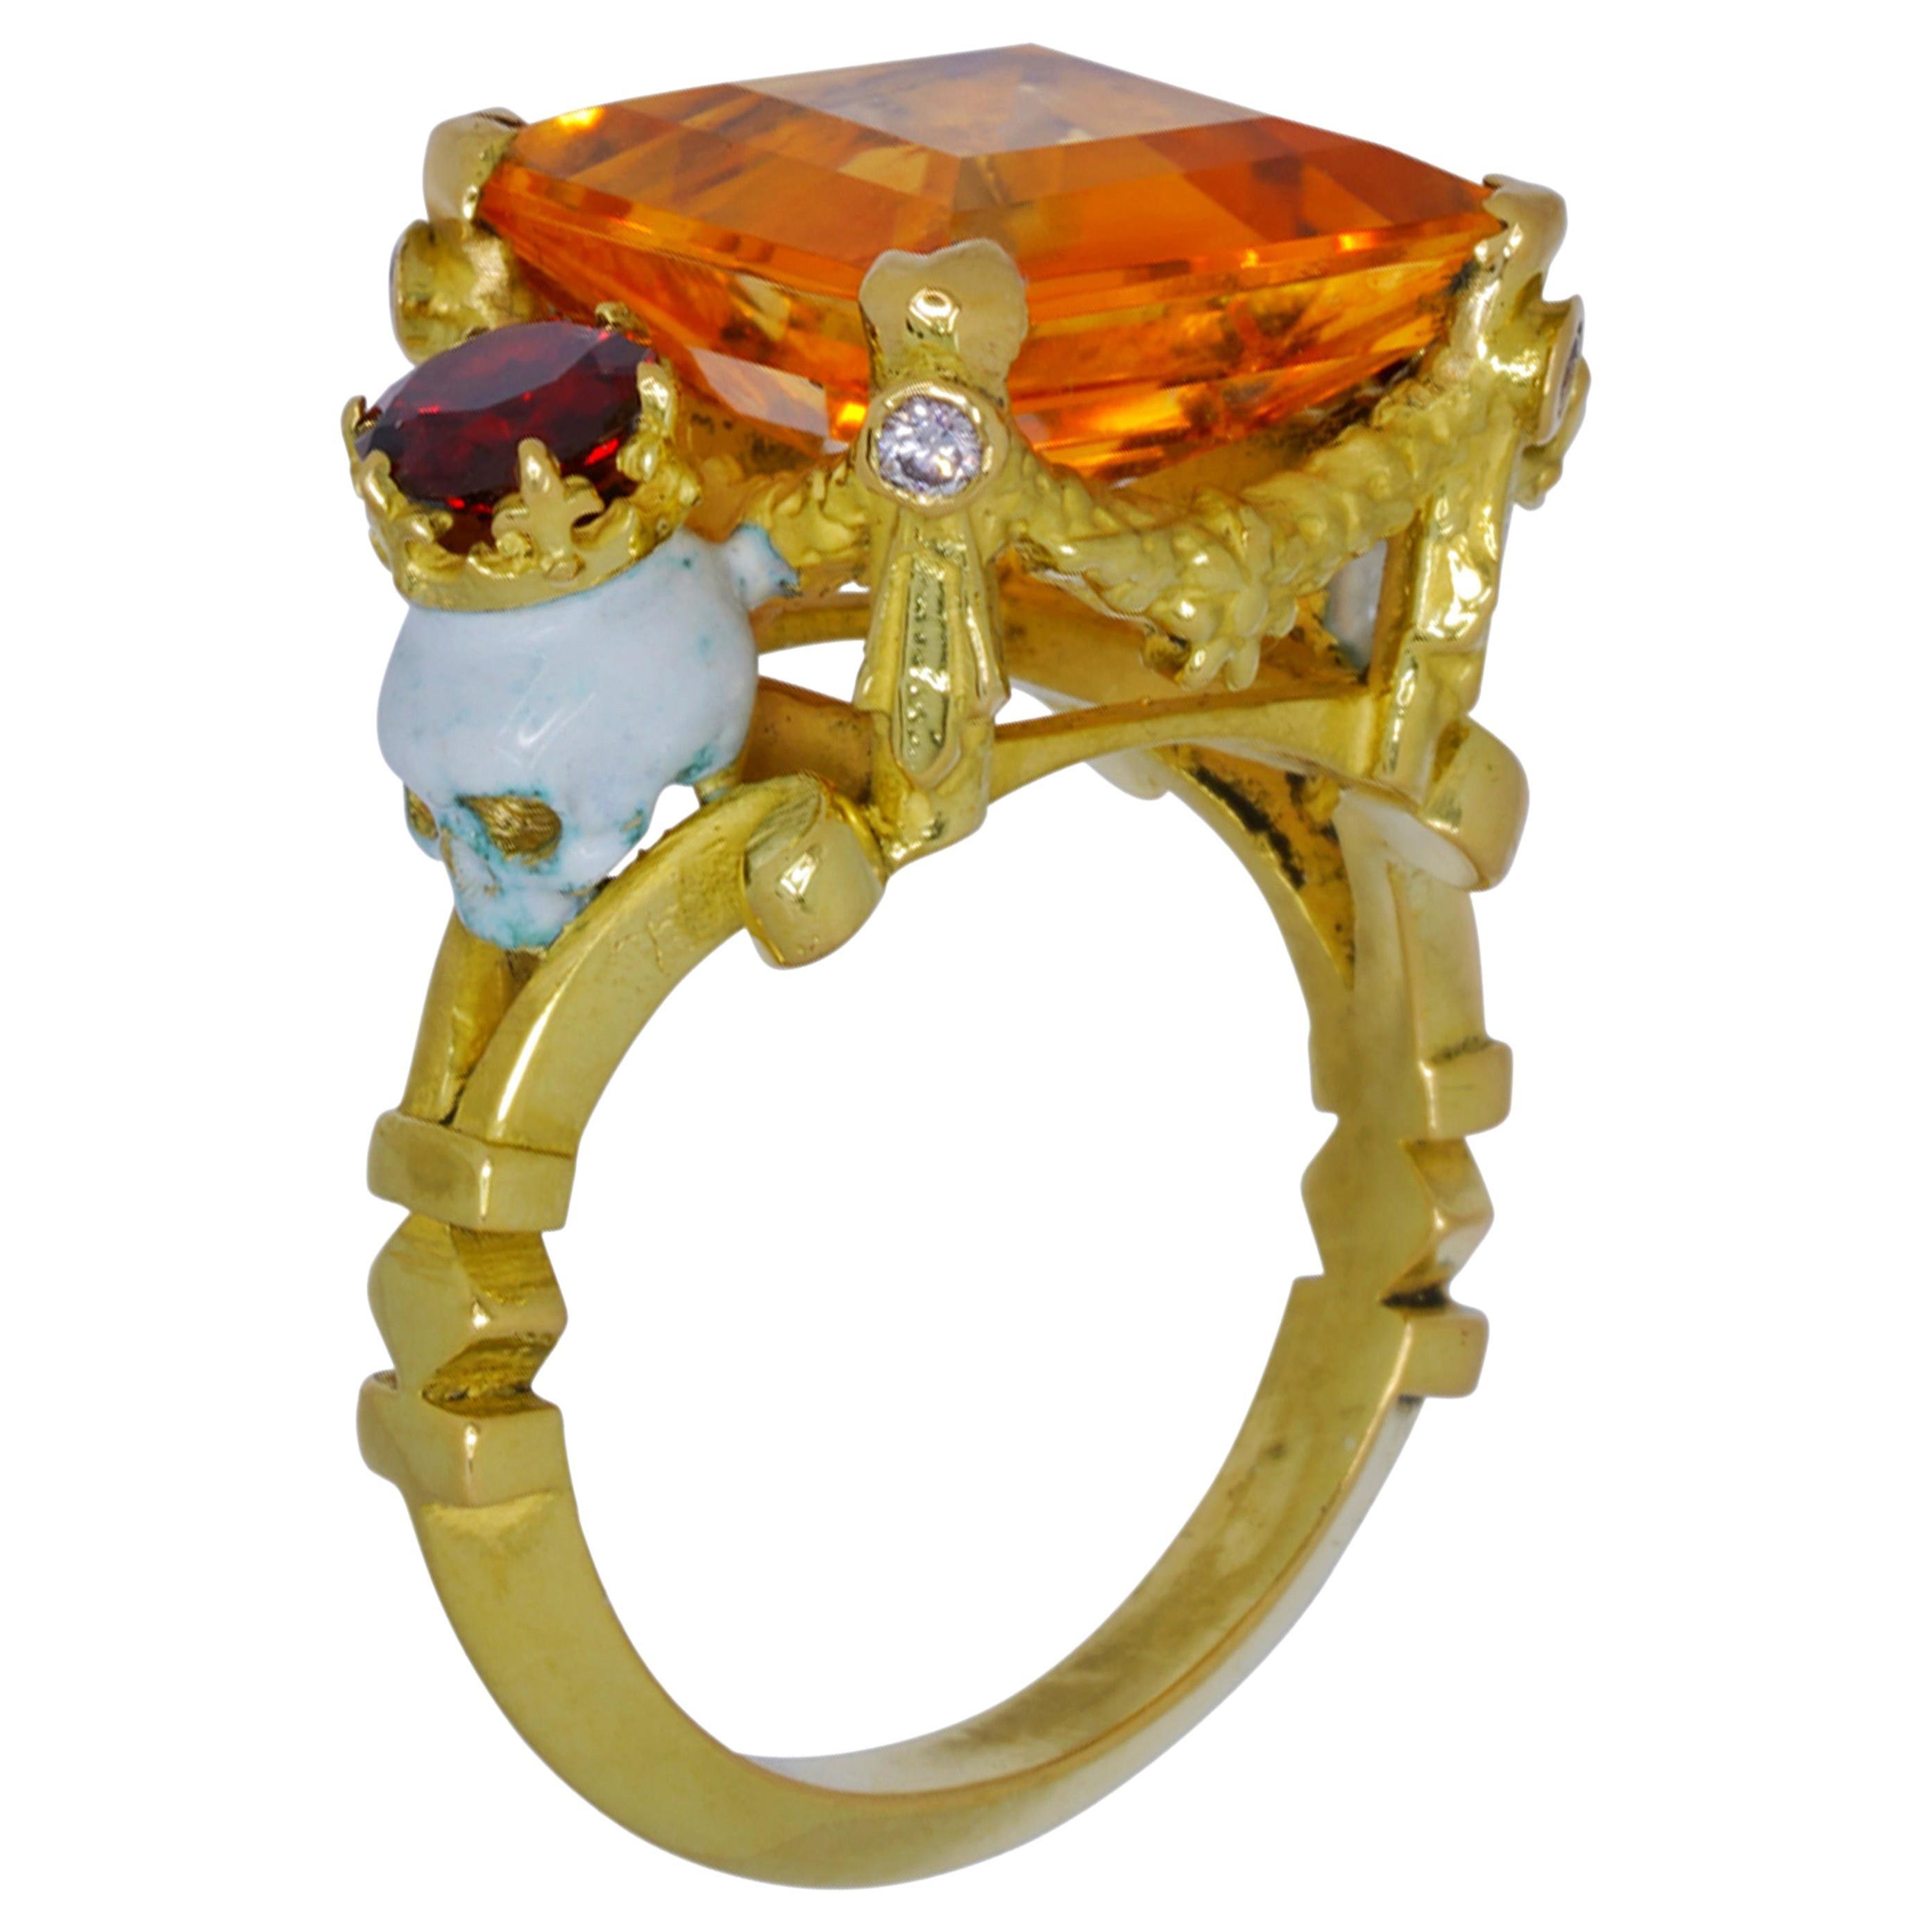 Catacomb Saints Garland Ring in 18 Karat Gold Citrine Garnets and Pink Diamonds